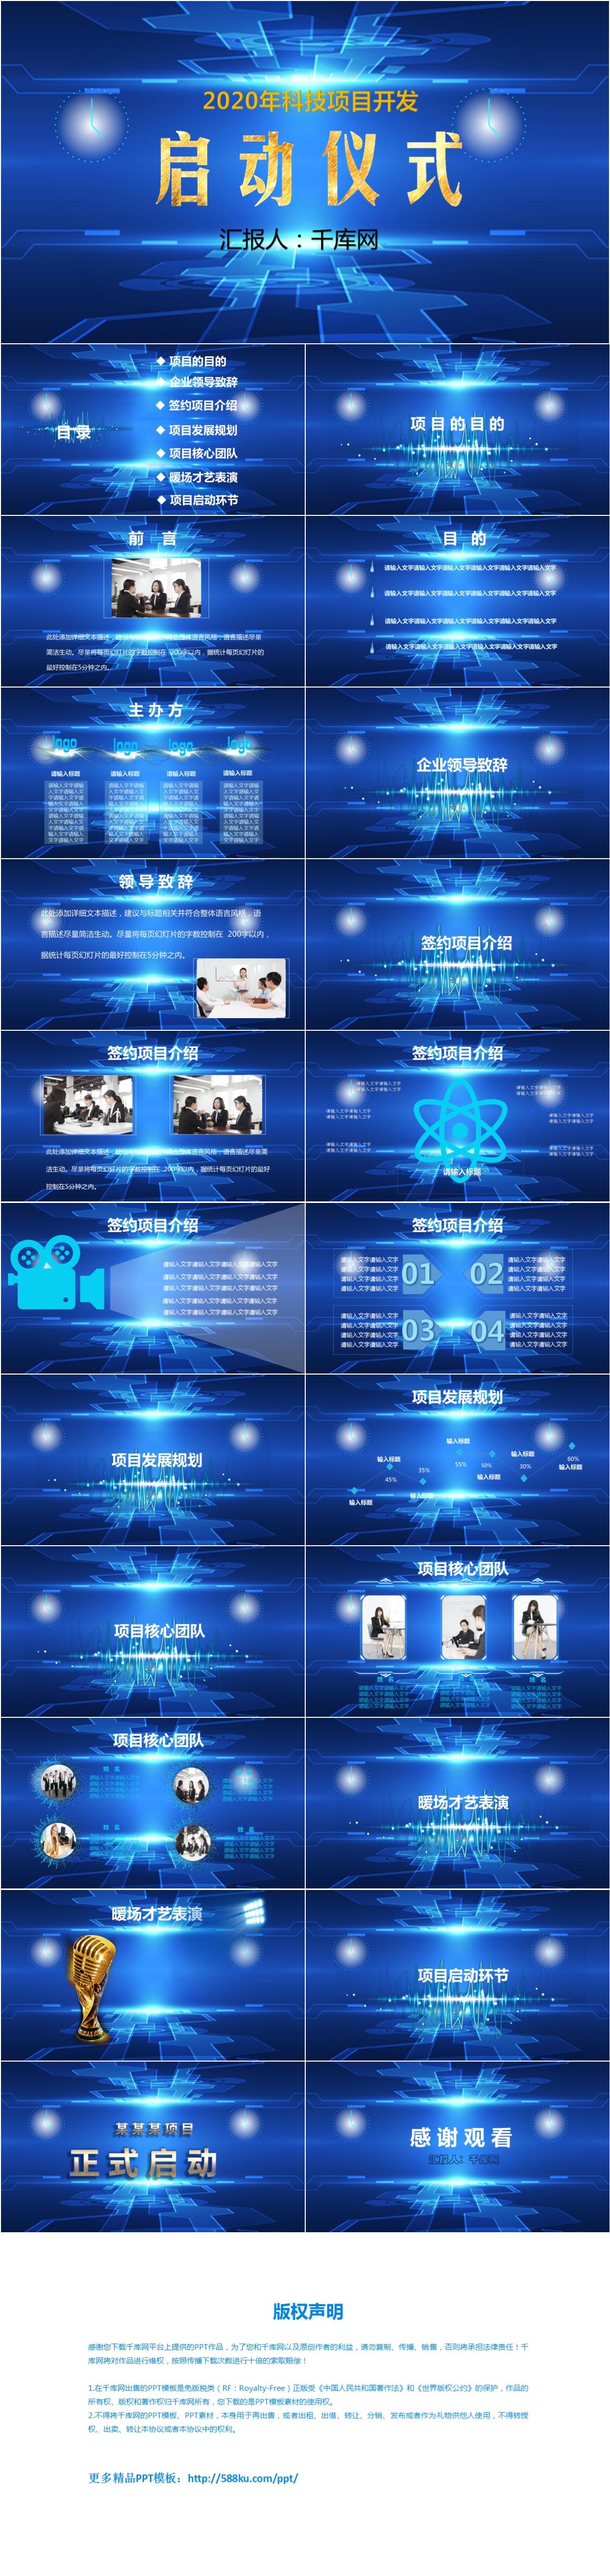 Blue Start Teknologi Angin Rencana Proyek Bisnis Template ...